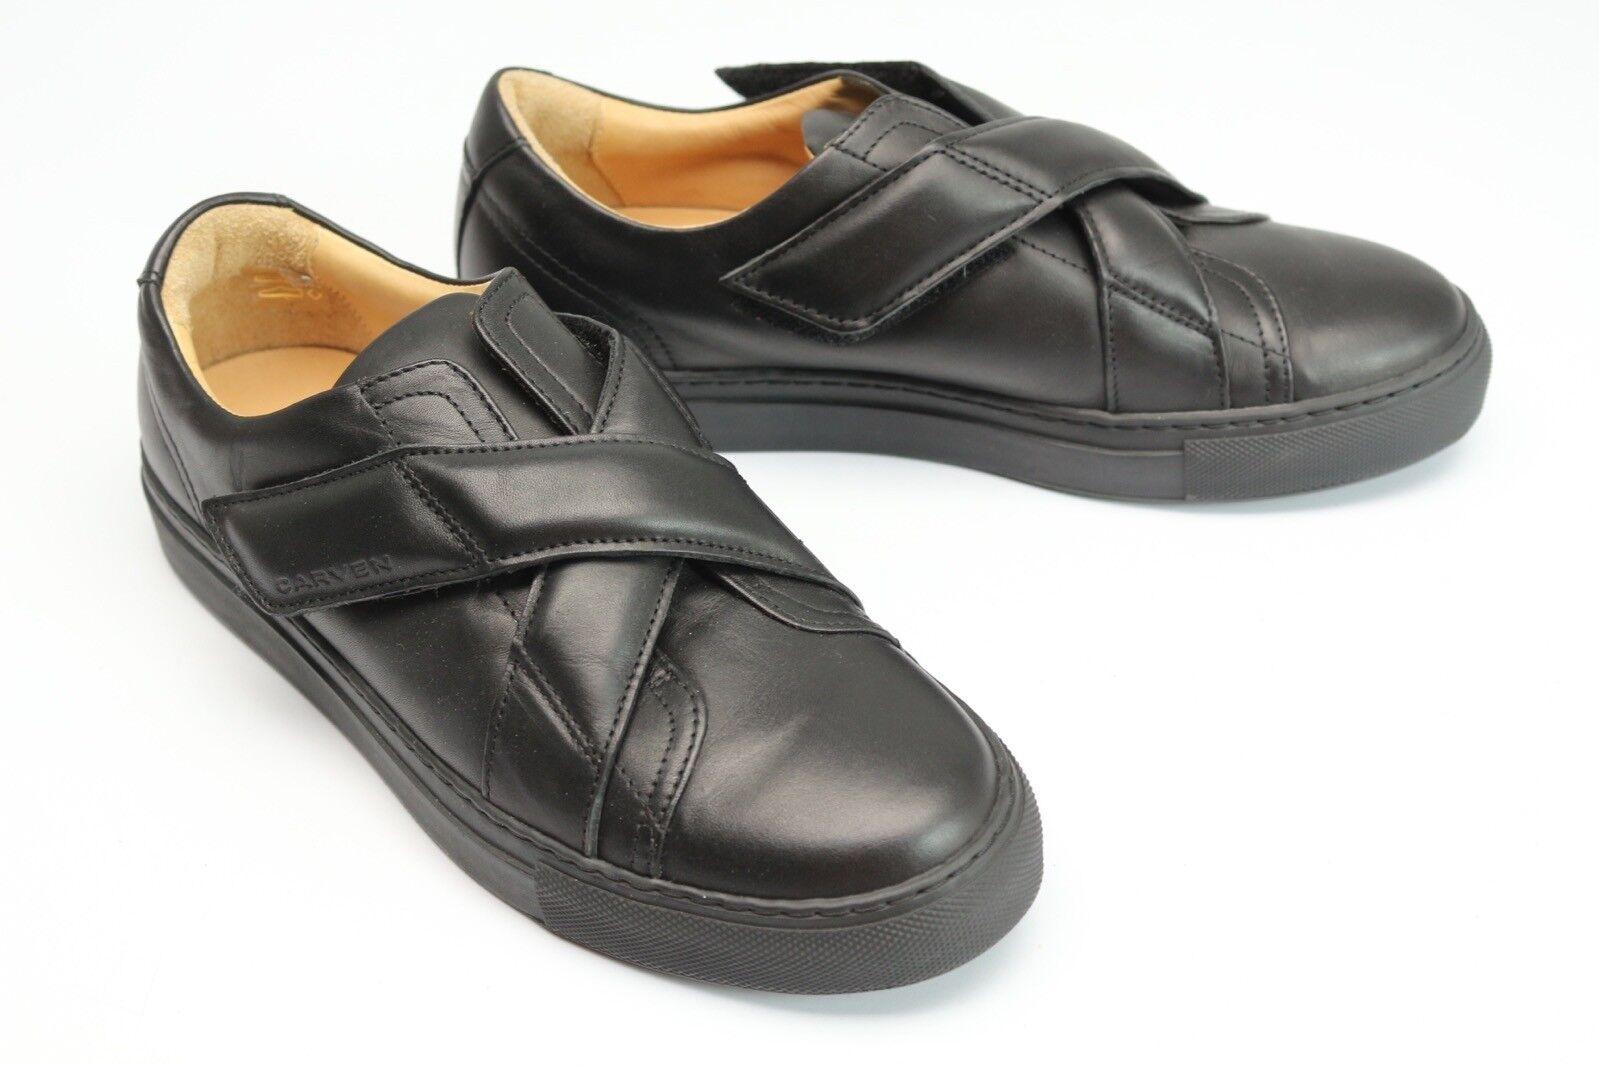 Carven Damen Schuhe 39 40 Mismatch Größe Schwarzes Leder Kreuz-Riemen Turnschuhe